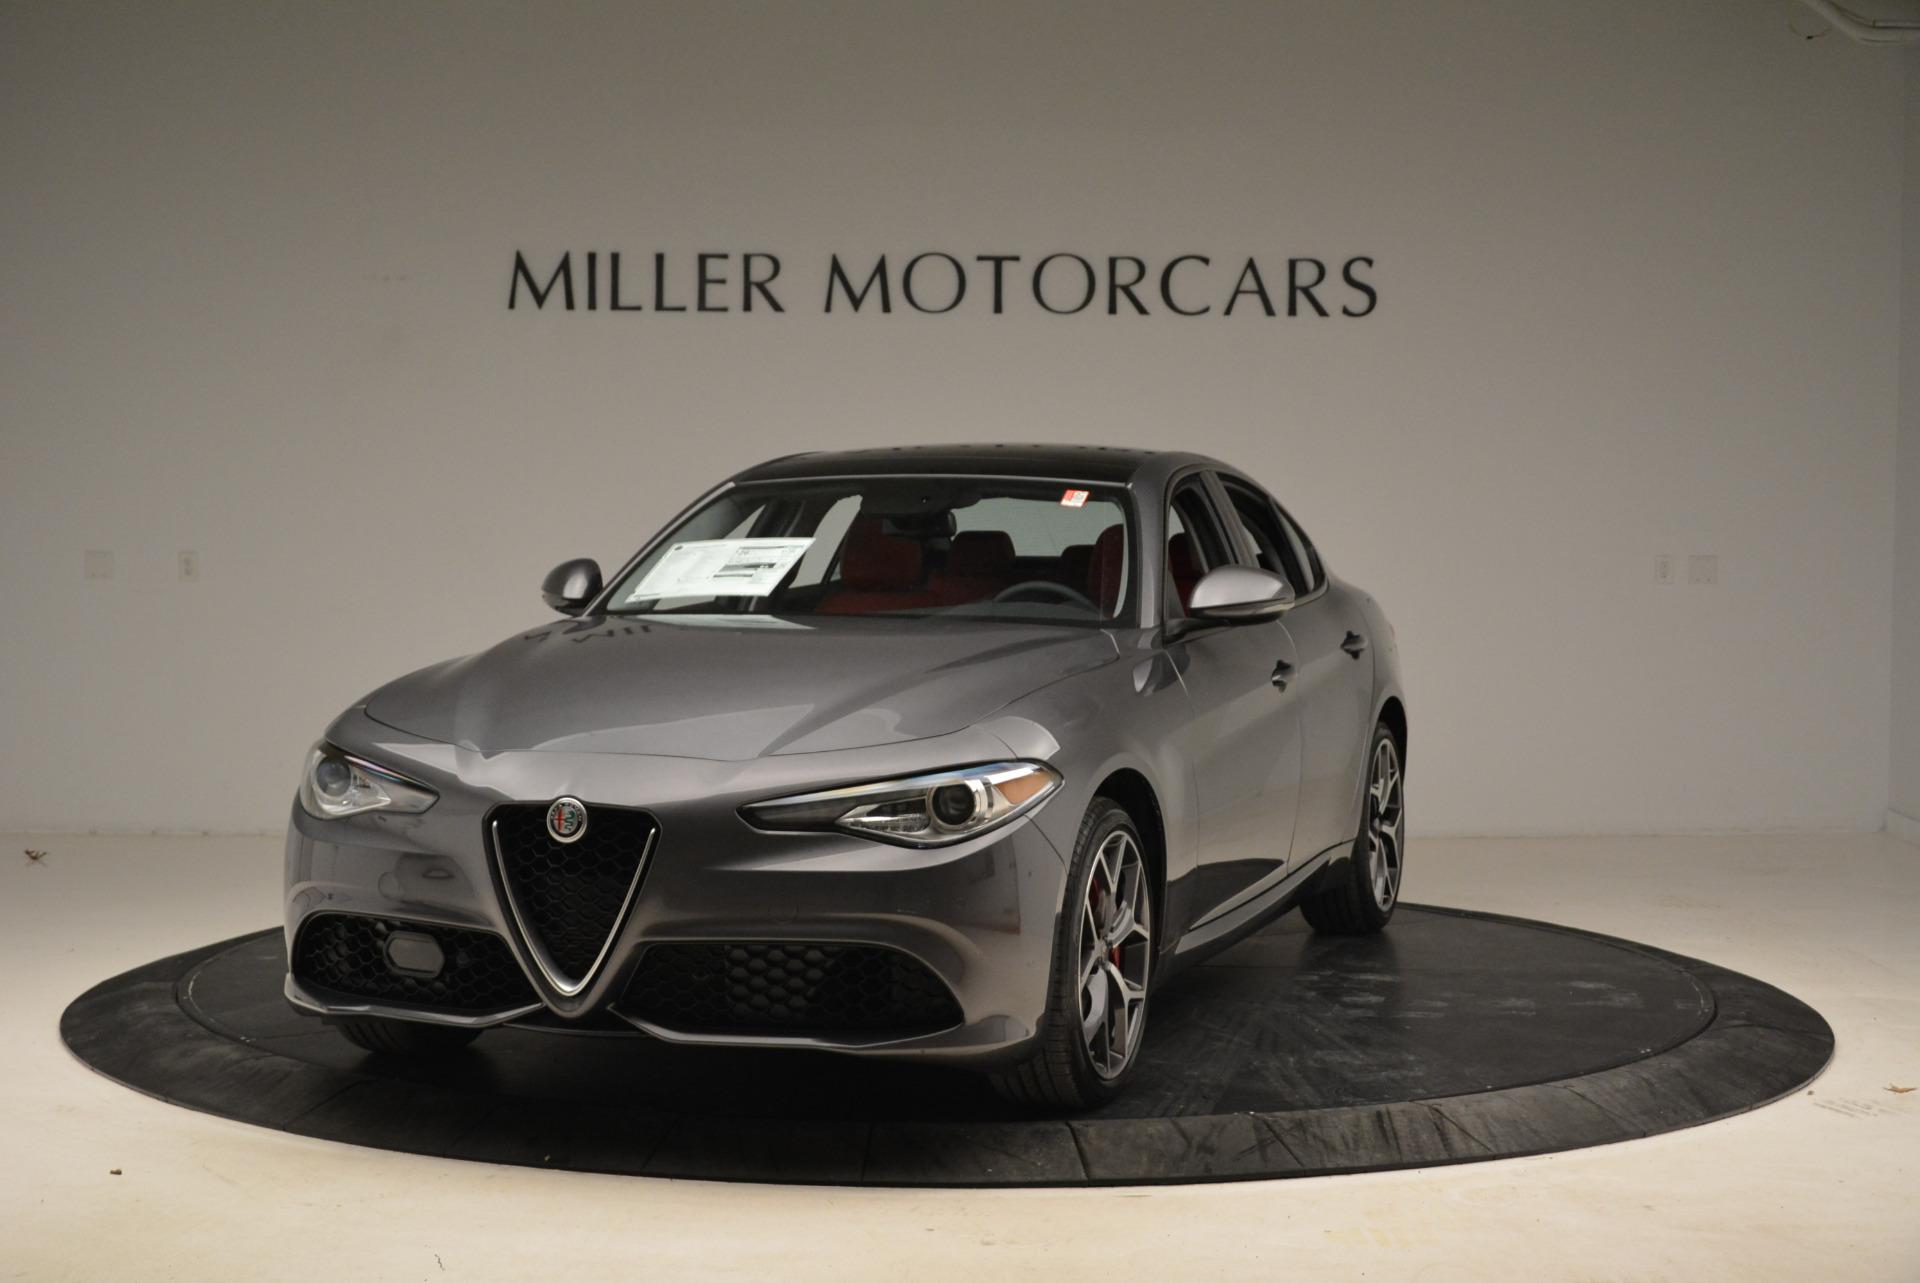 2018 Alfa Romeo Giulia Prices Incentives amp Dealers  TrueCar